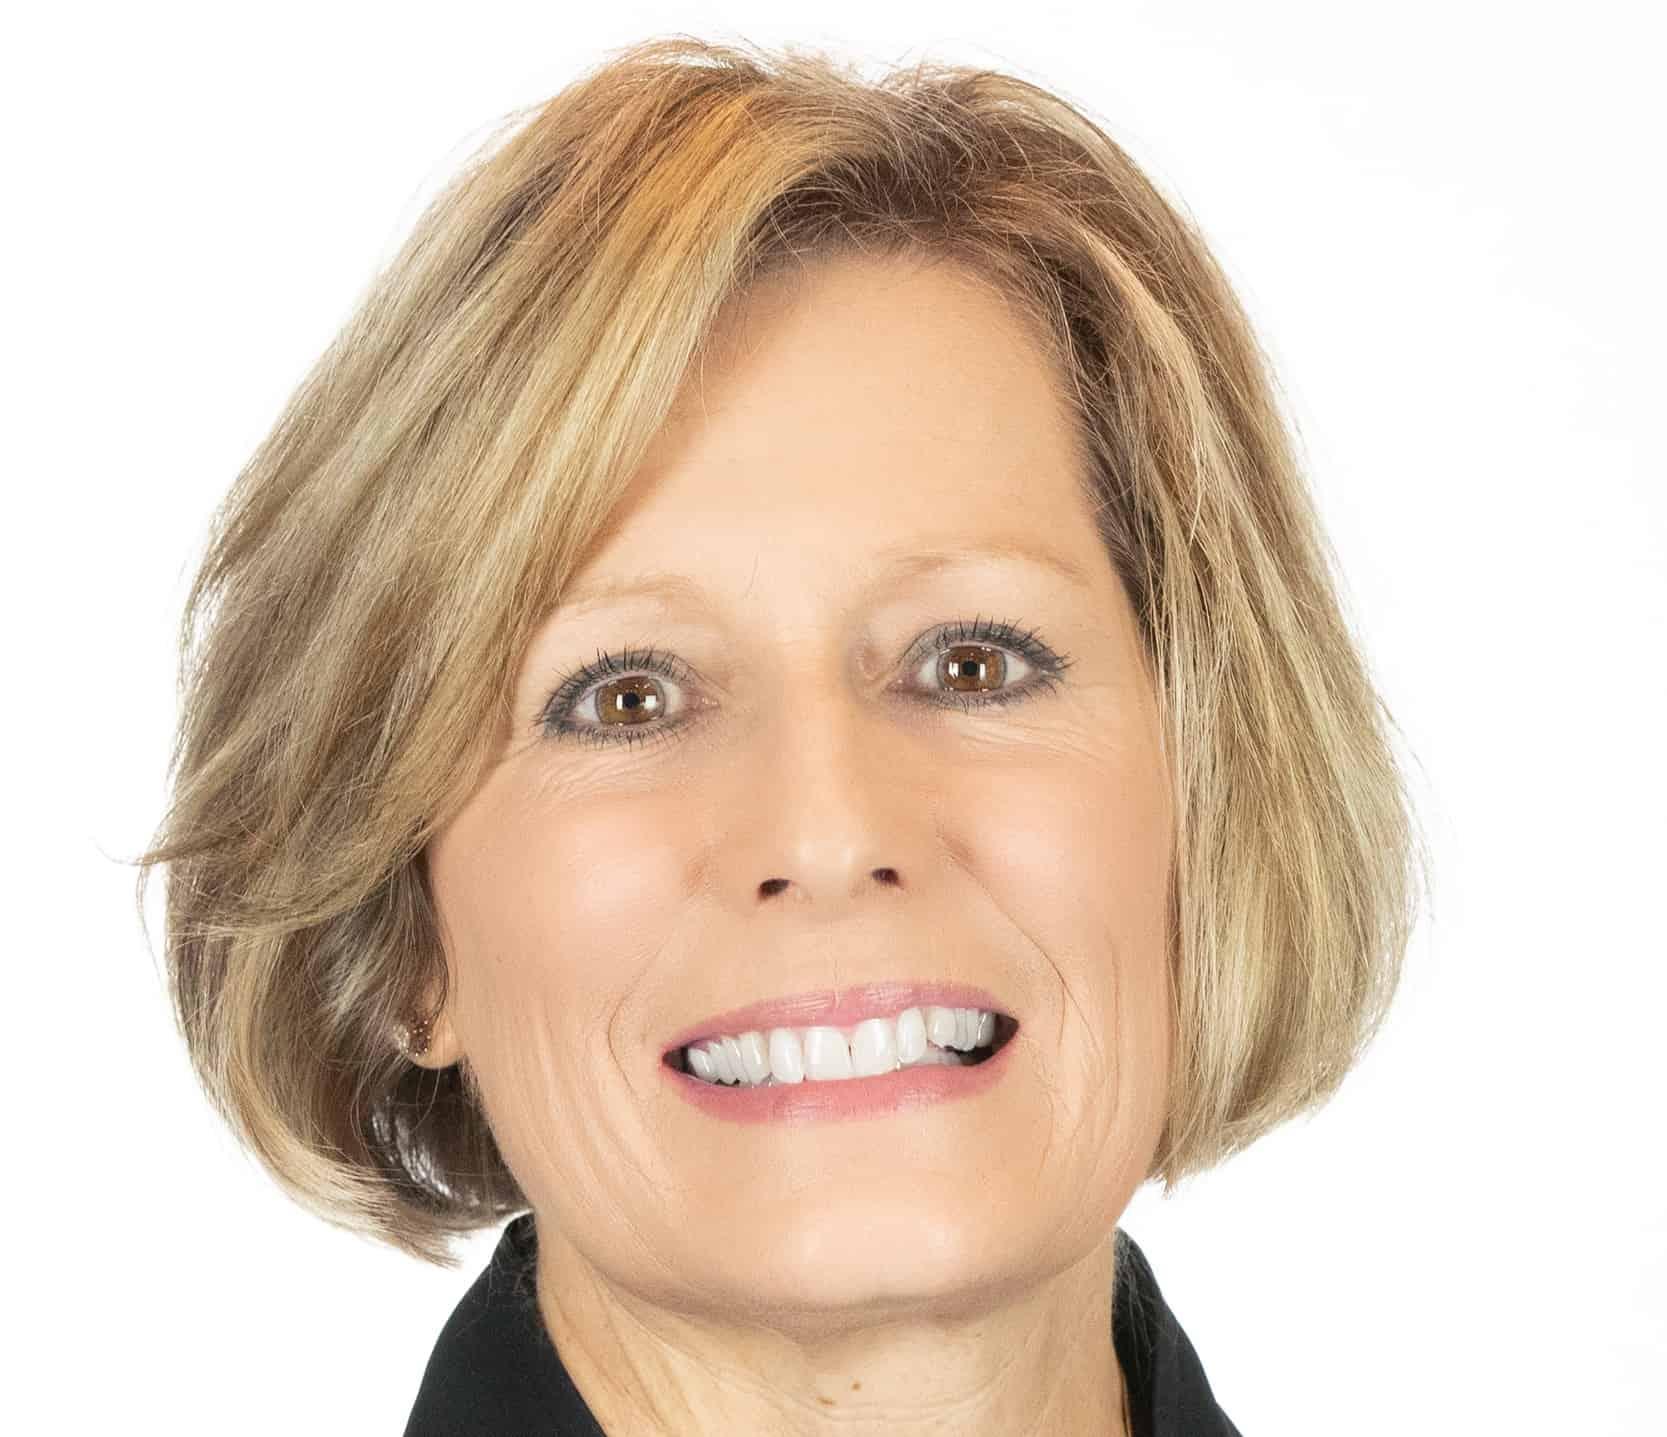 Leanne Lefler, Ph.D., RN, APRN, FAHA